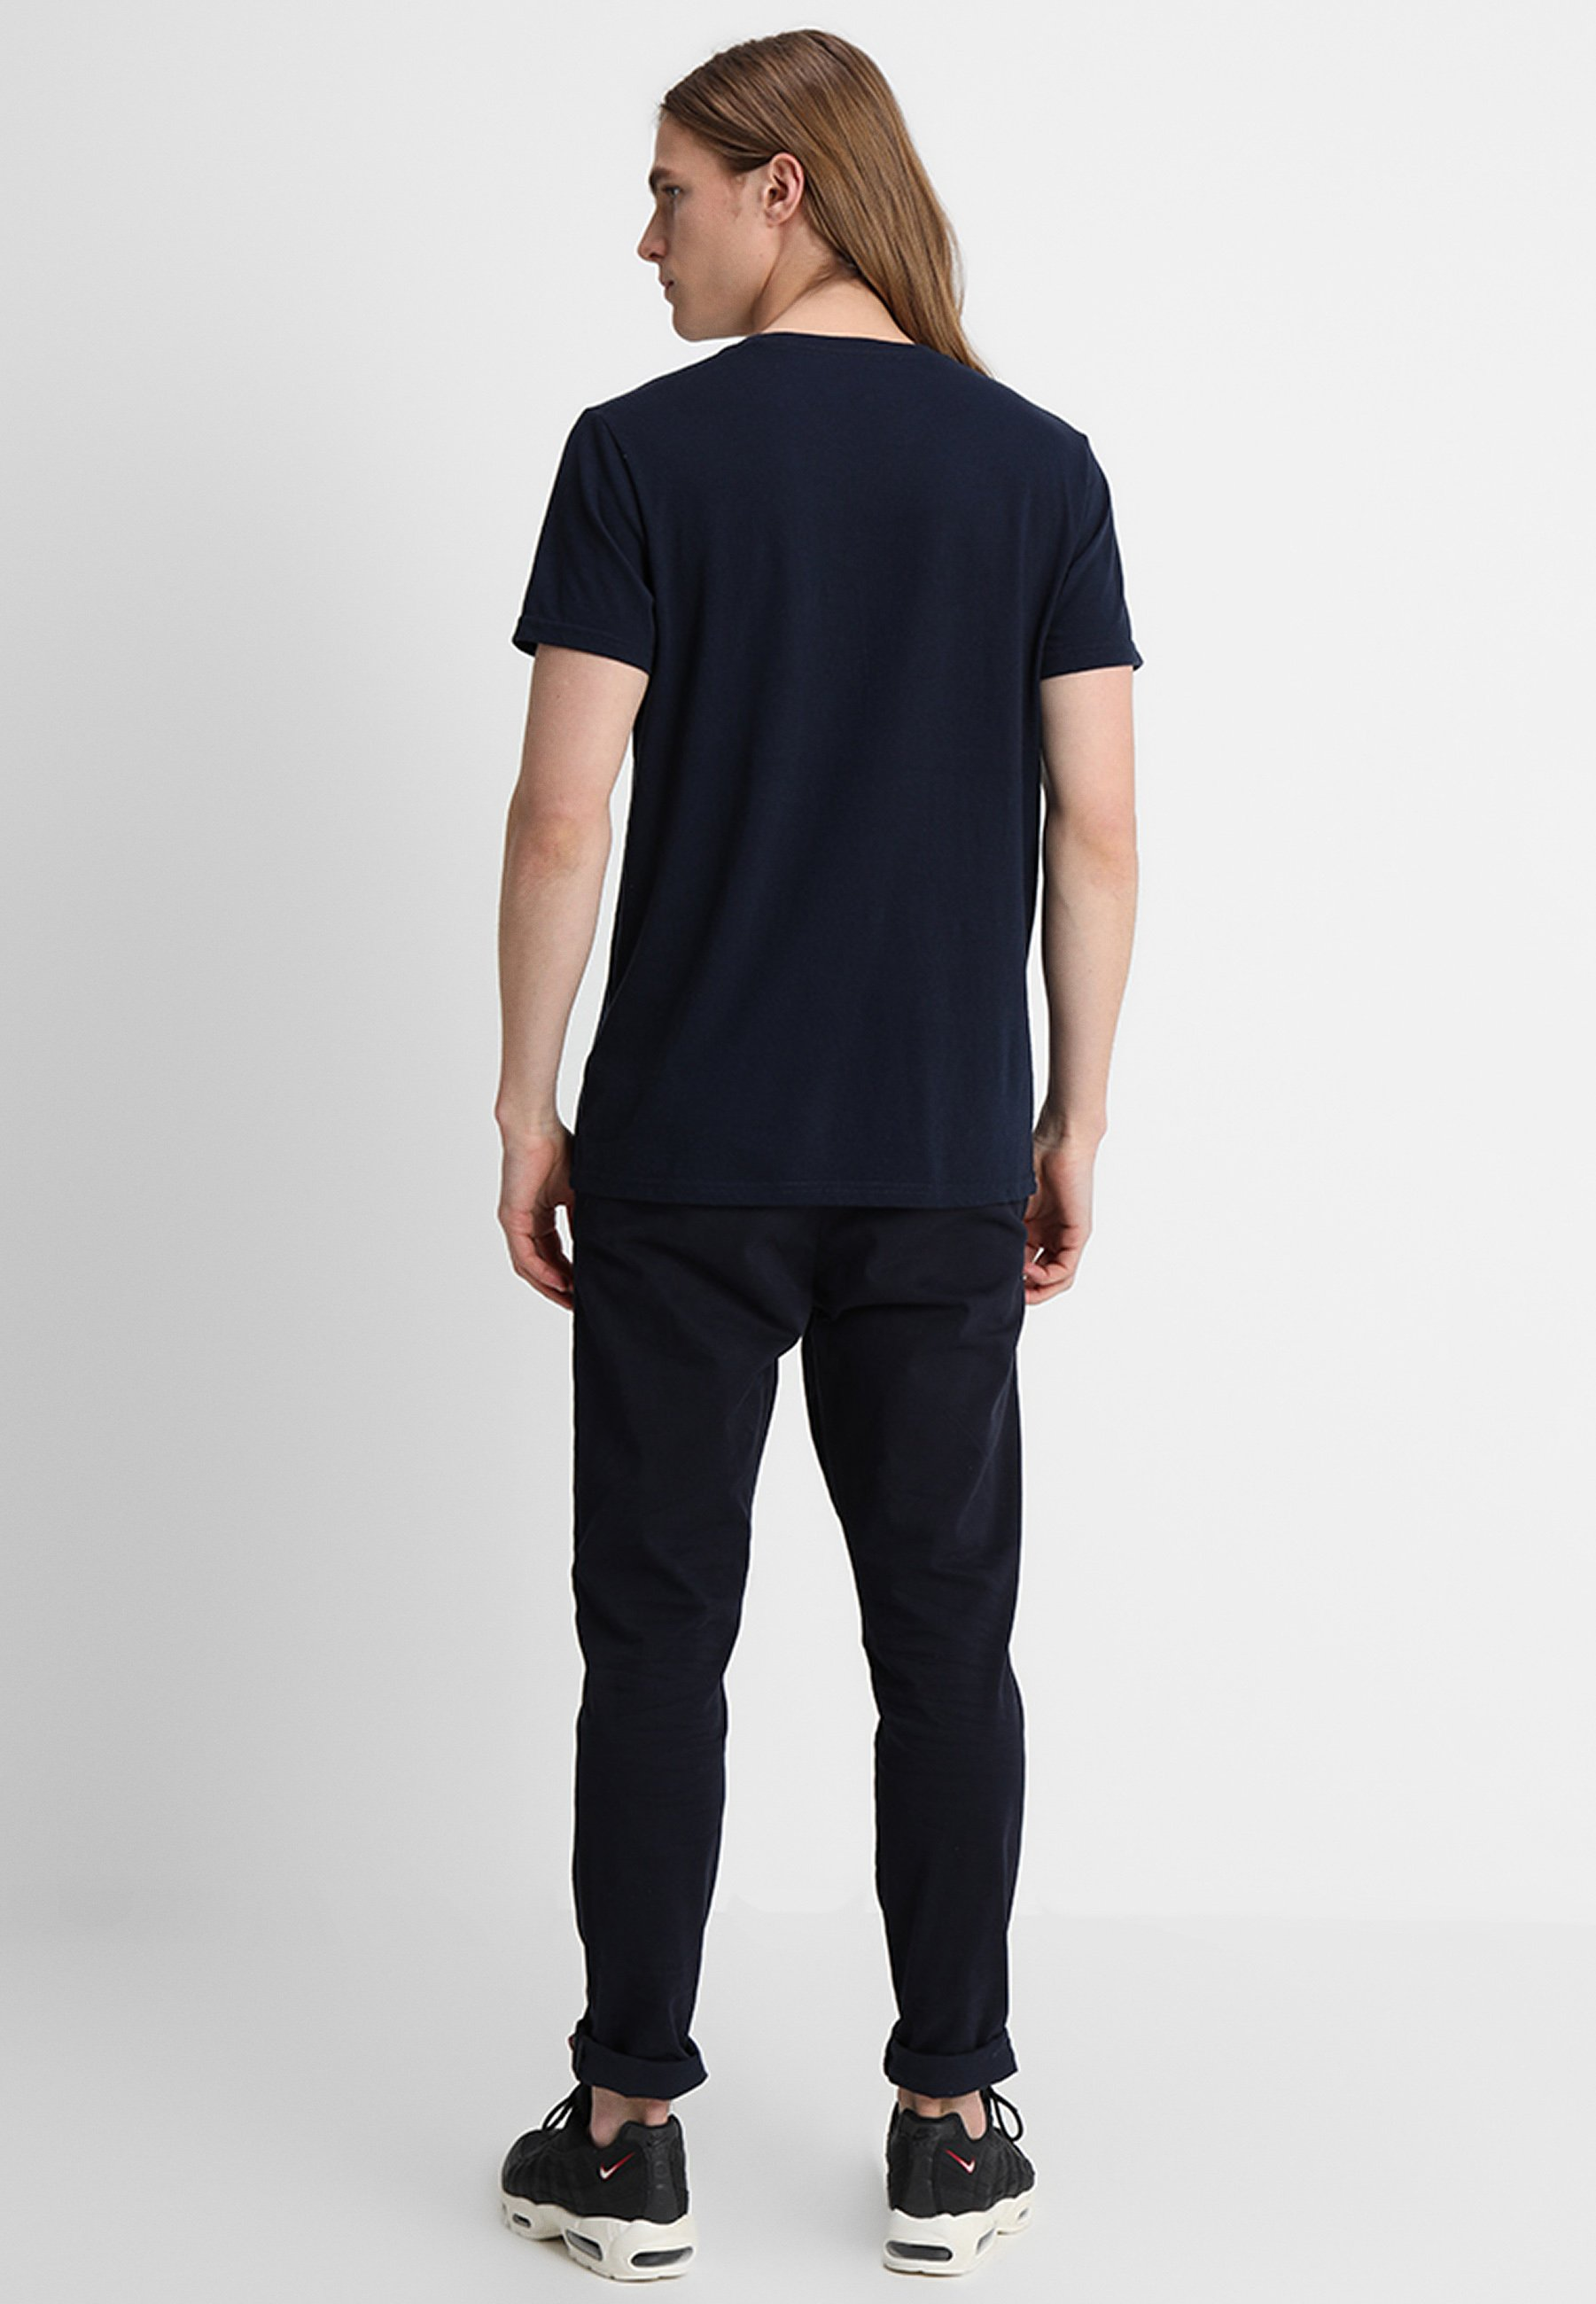 Hollister Co. Crew 3 Pack - T-shirts Navy/burgundy/grey/mørkeblå